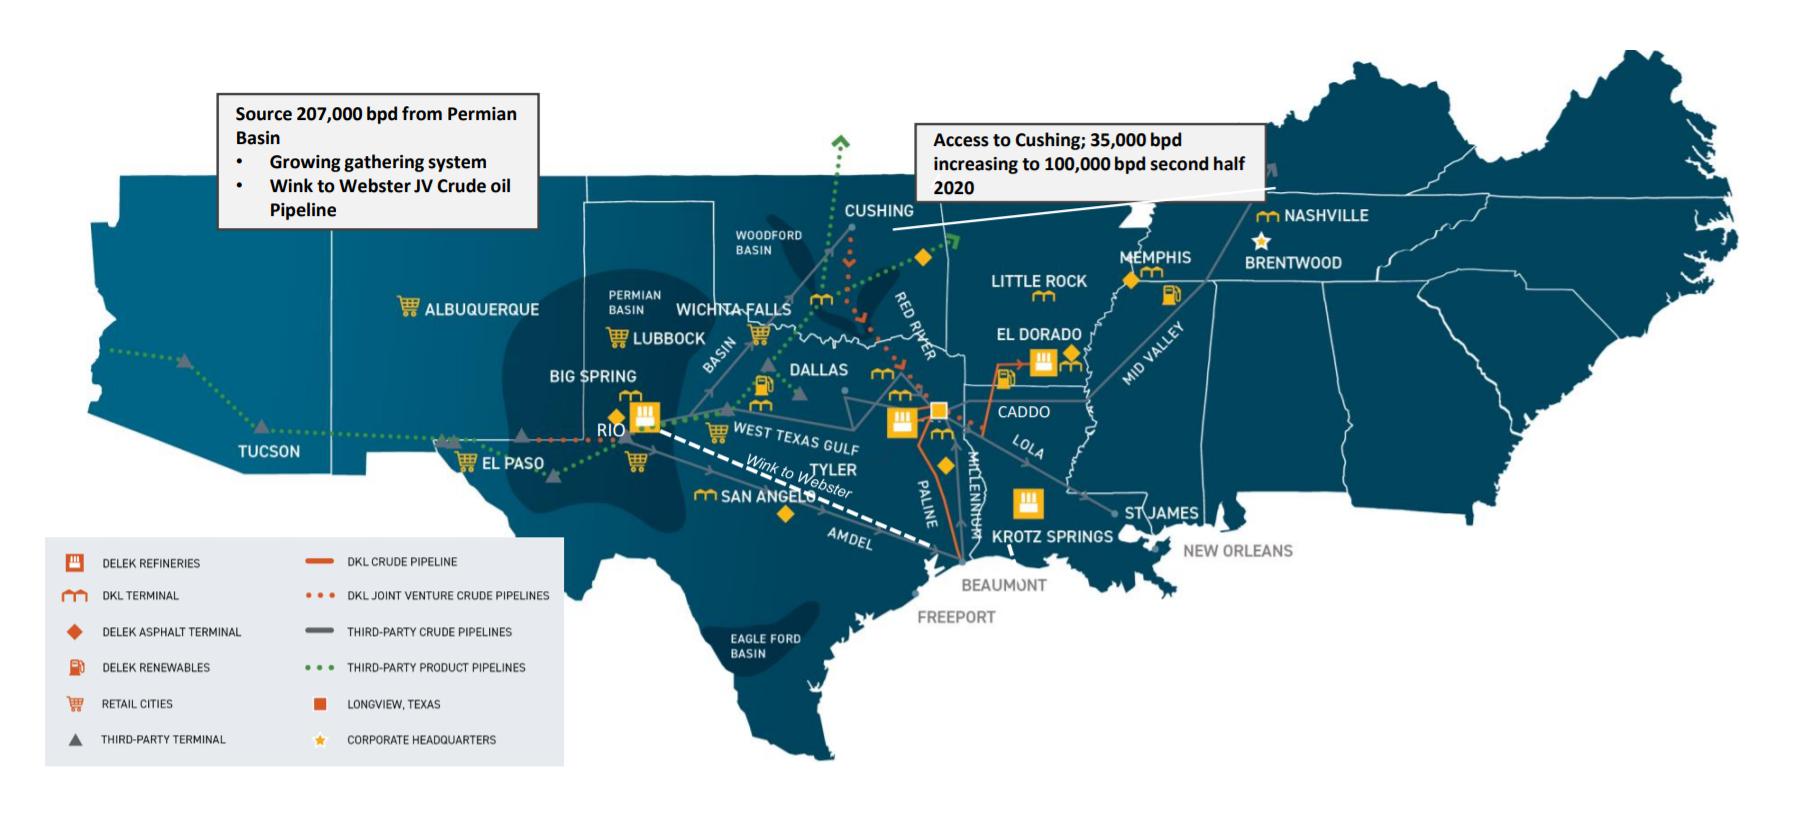 Карта активов компании. Источник: презентация компании, слайд4